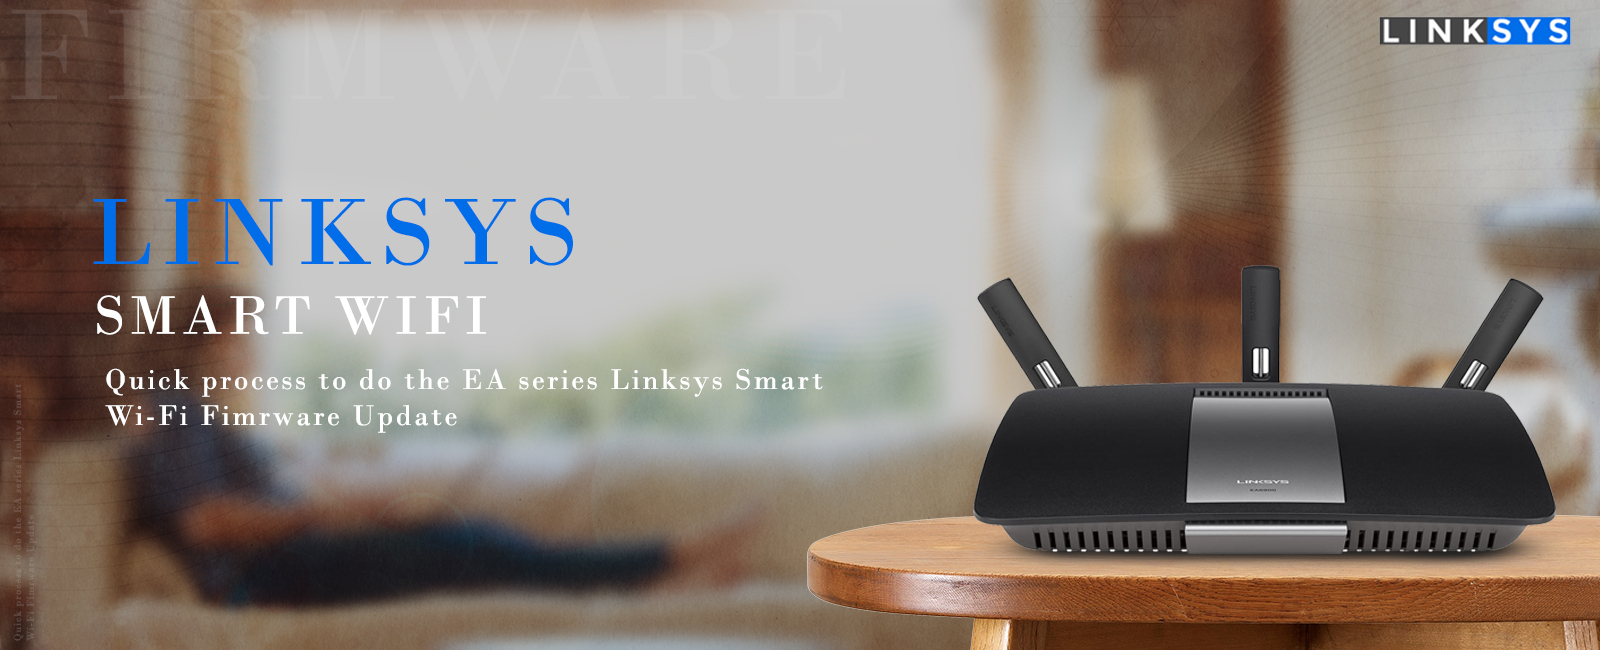 EA series Linksys smart wi-fi firmware update